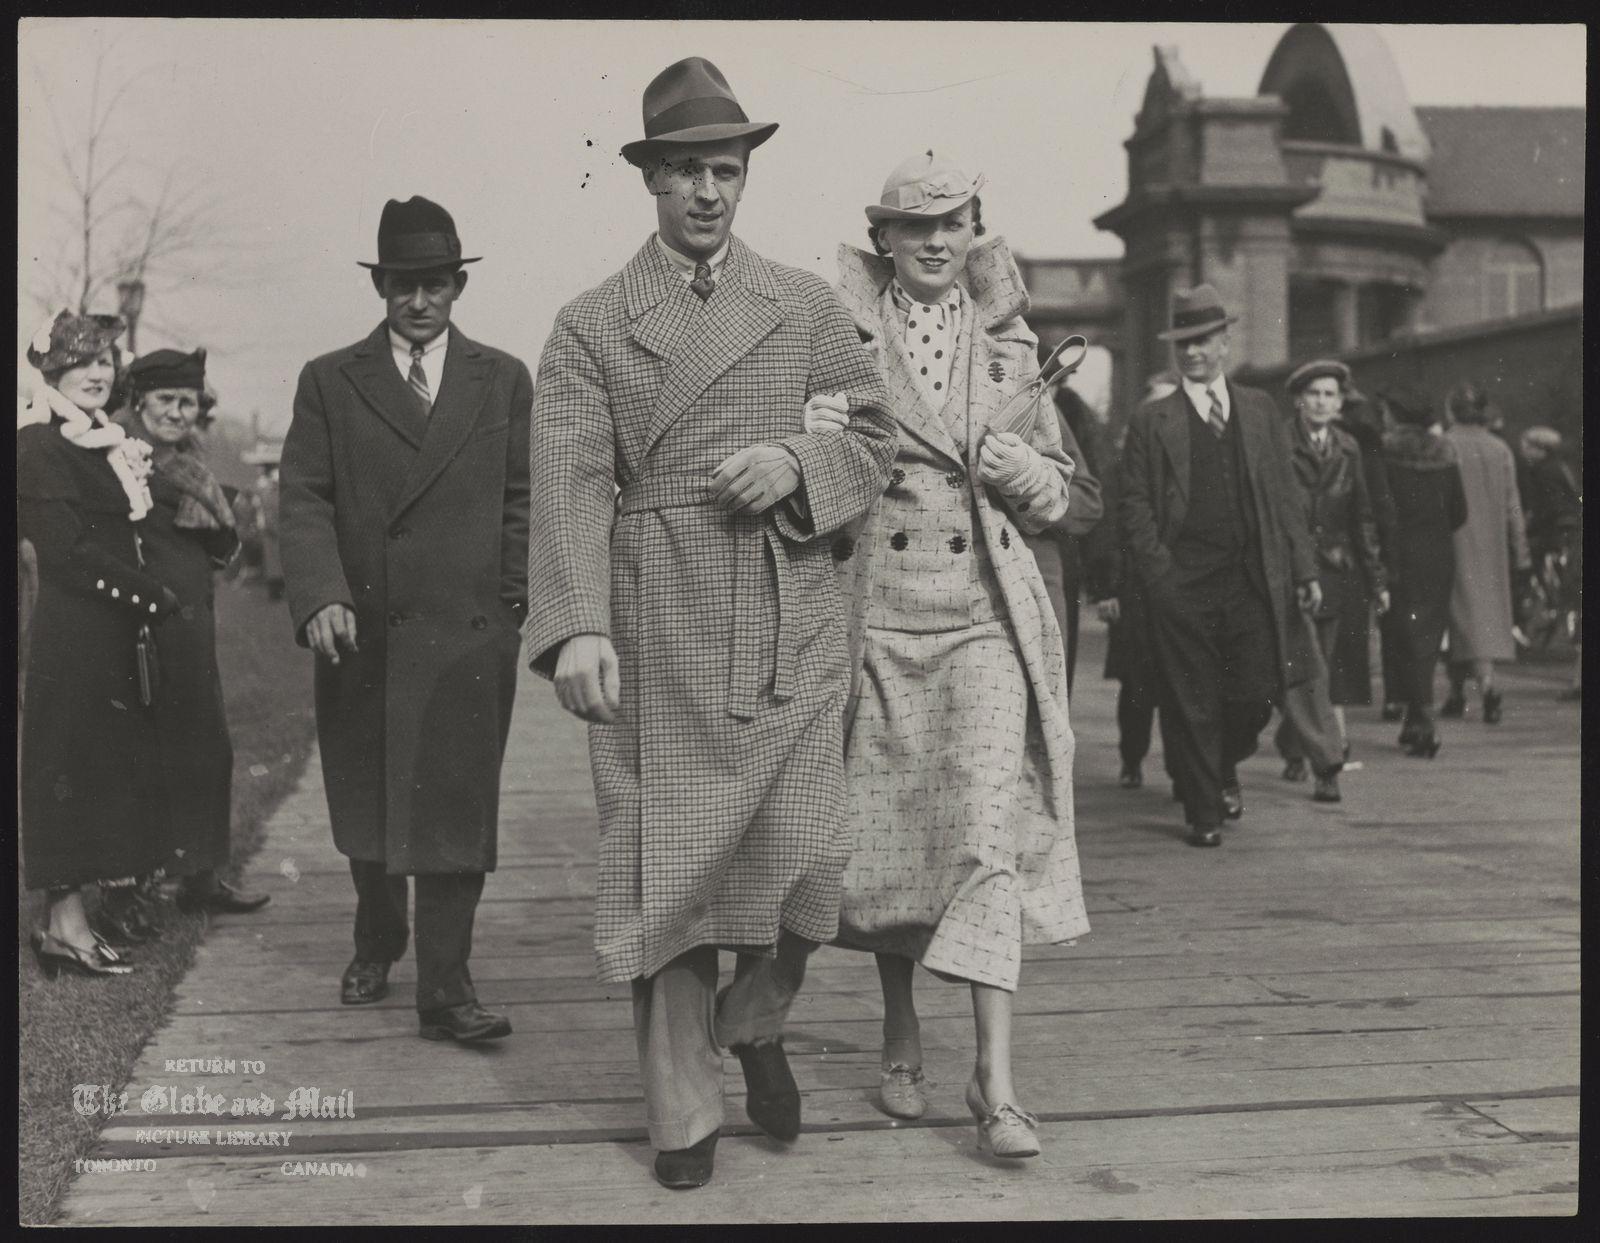 EASTER FASHION PARADE Unidentified couples on Sunnyside Boardwalk 1936.